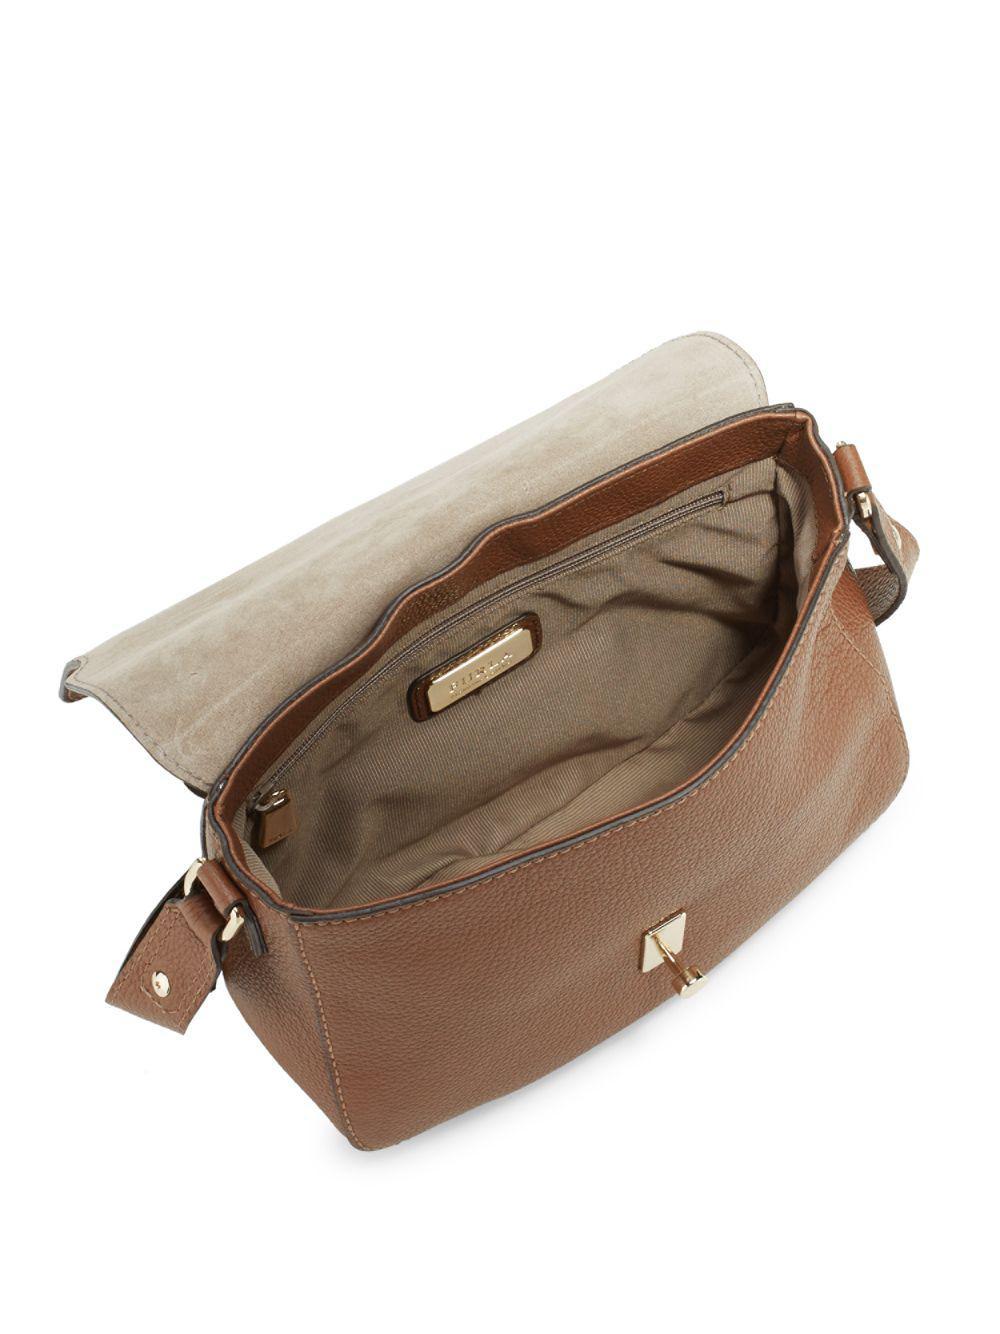 d8d5a7612673 Lyst - Furla Jo M Leather Crossbody Bag in Brown